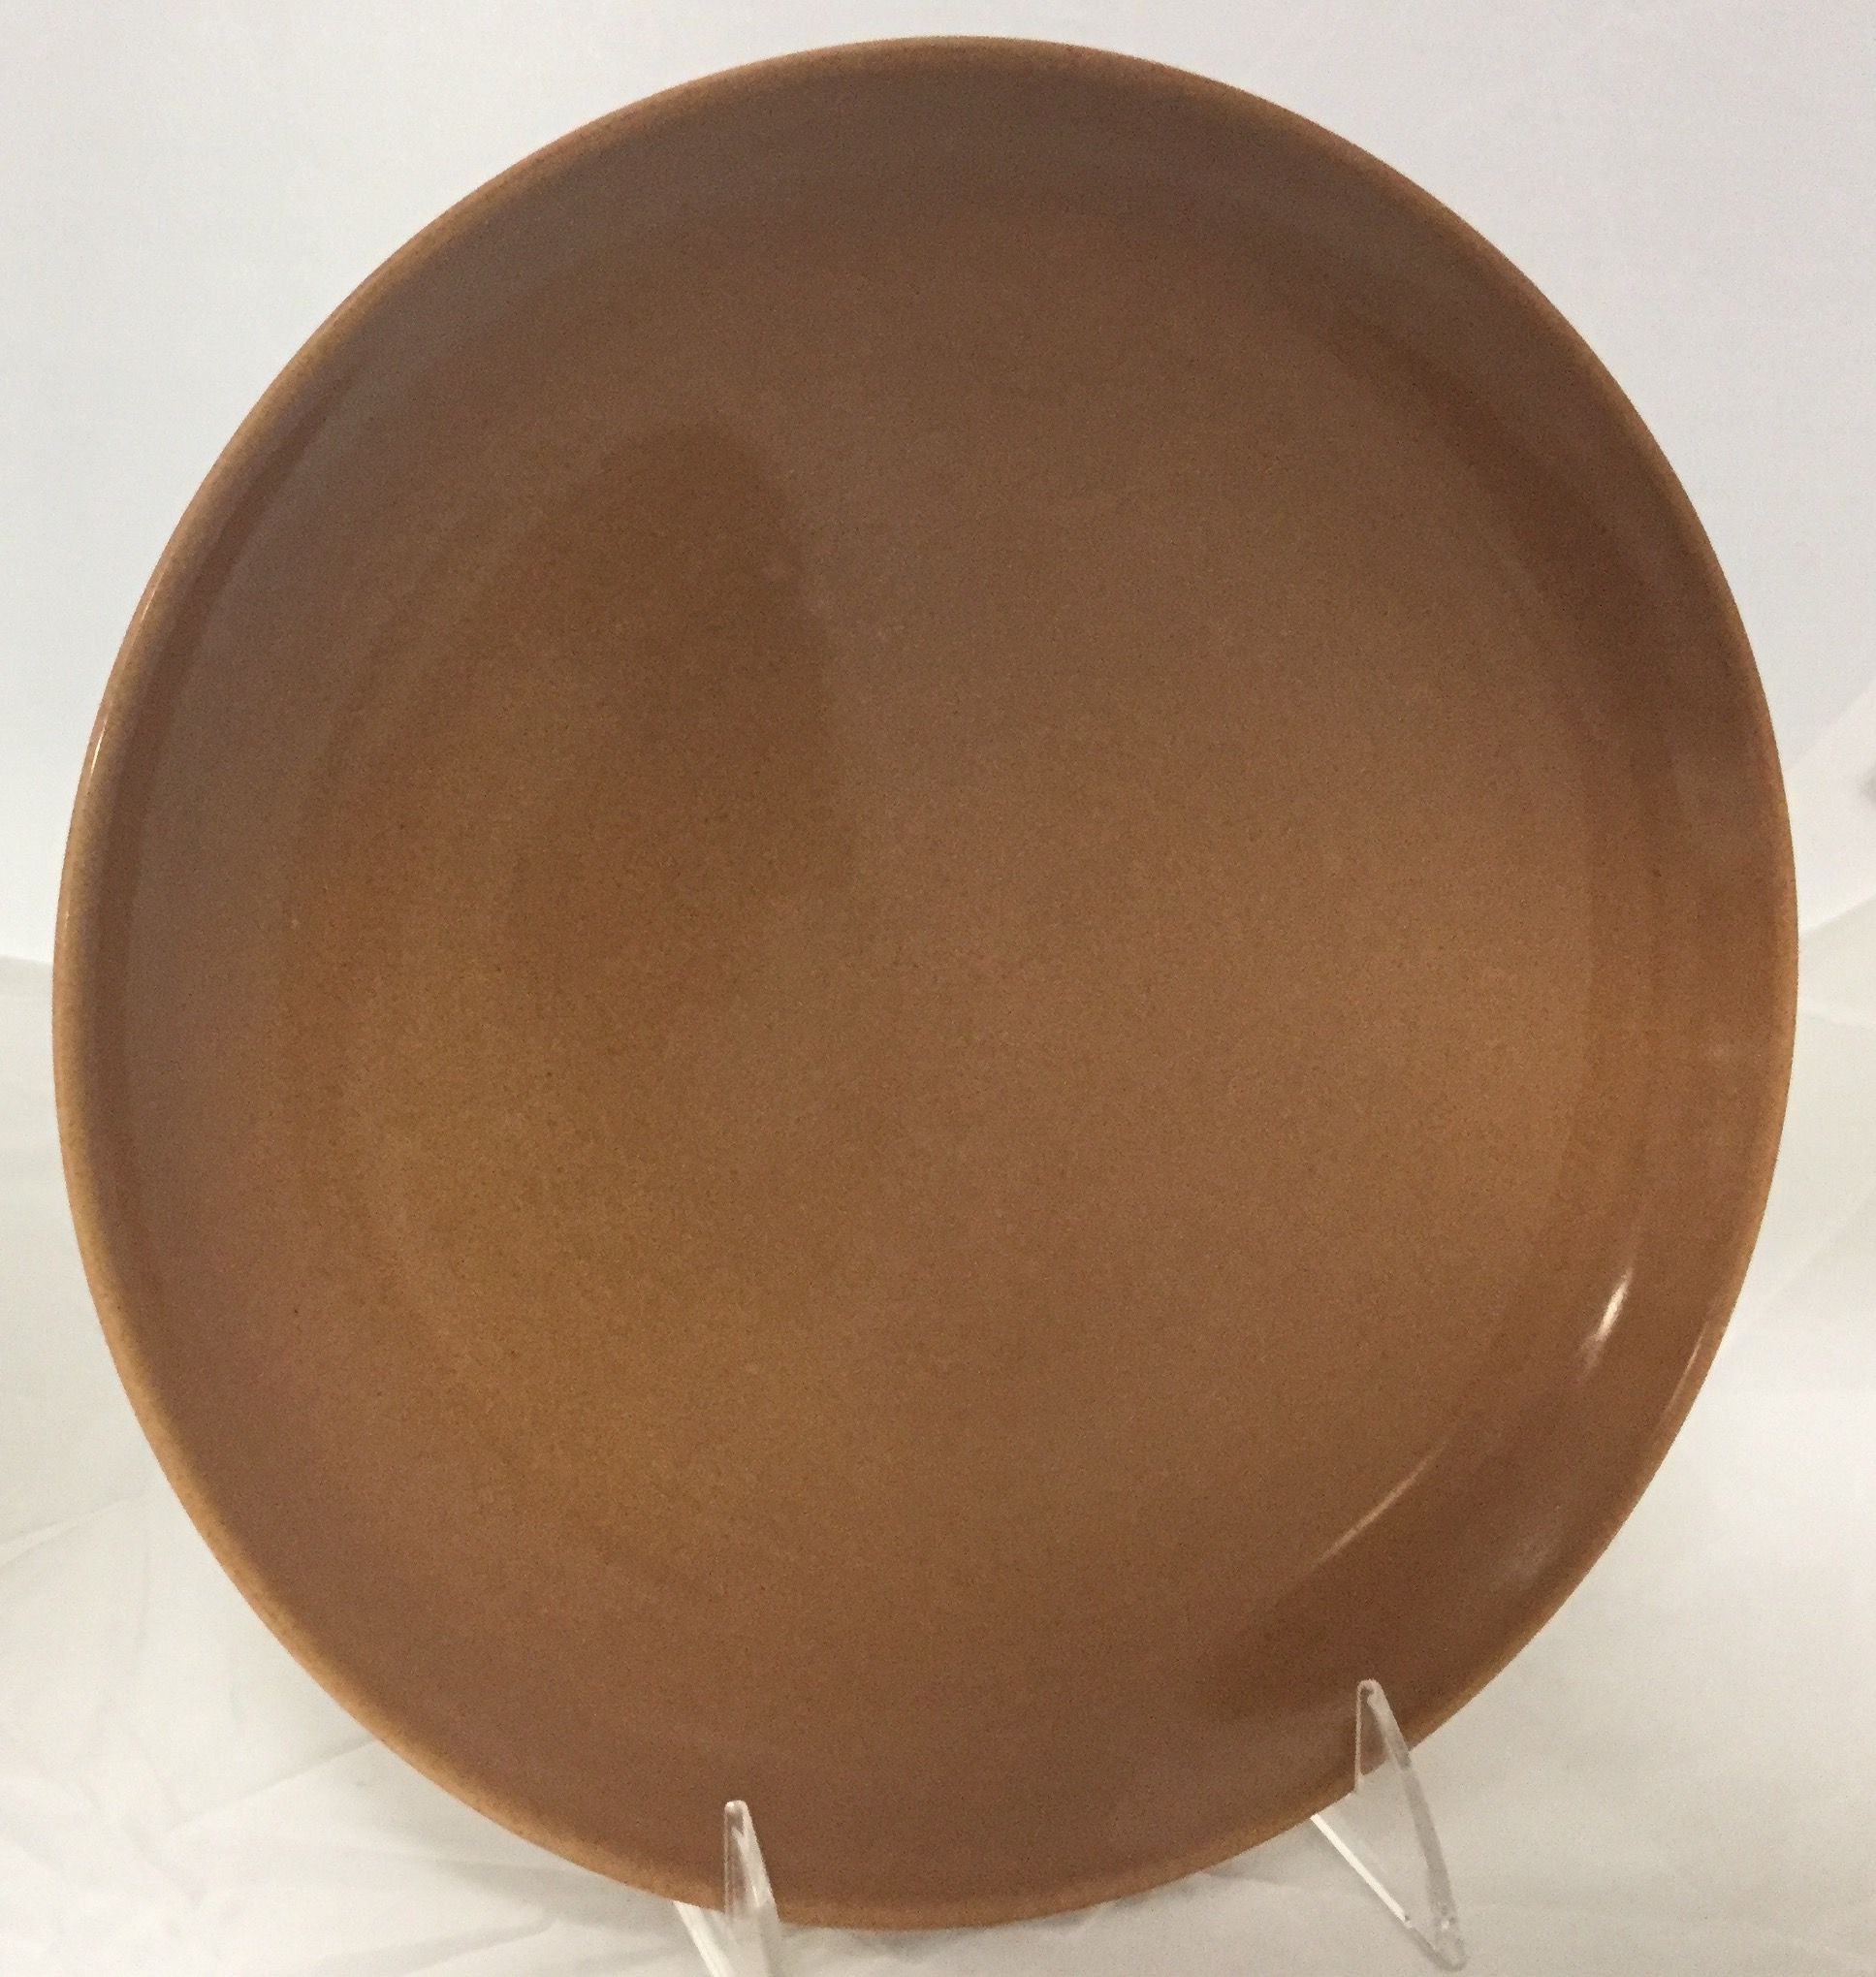 Rusell-Wright-Dinner-Plate_58763A.jpg